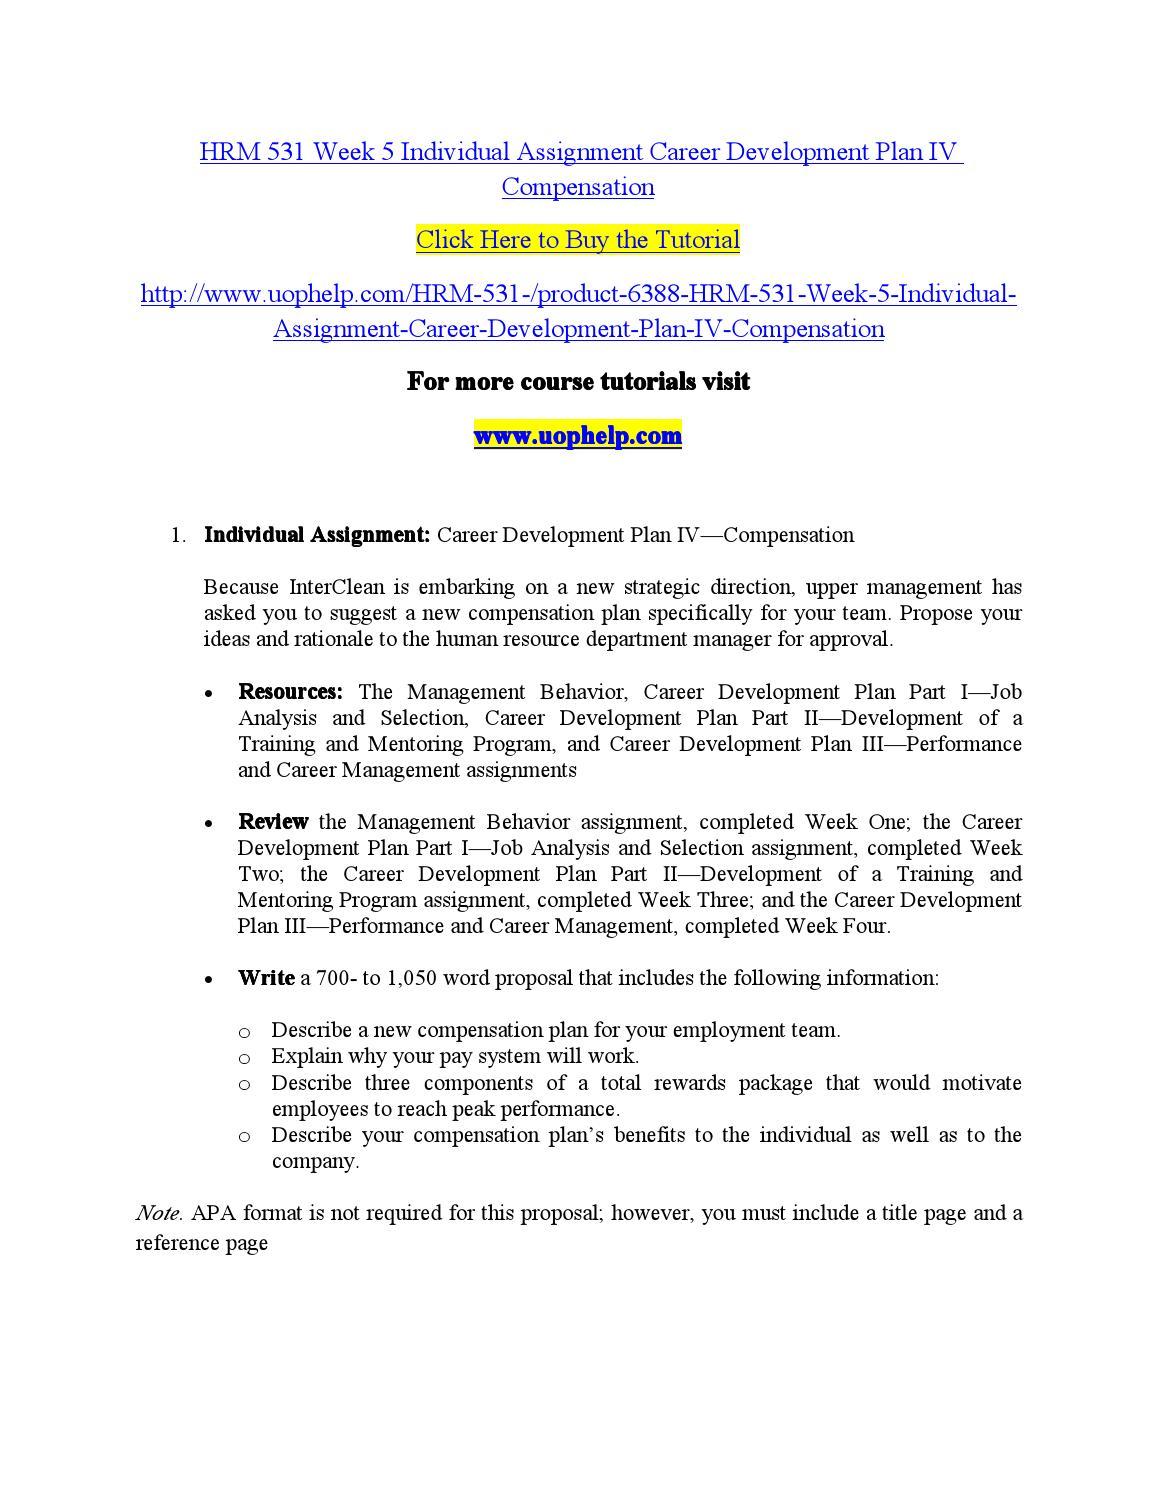 career development iv compensation essay